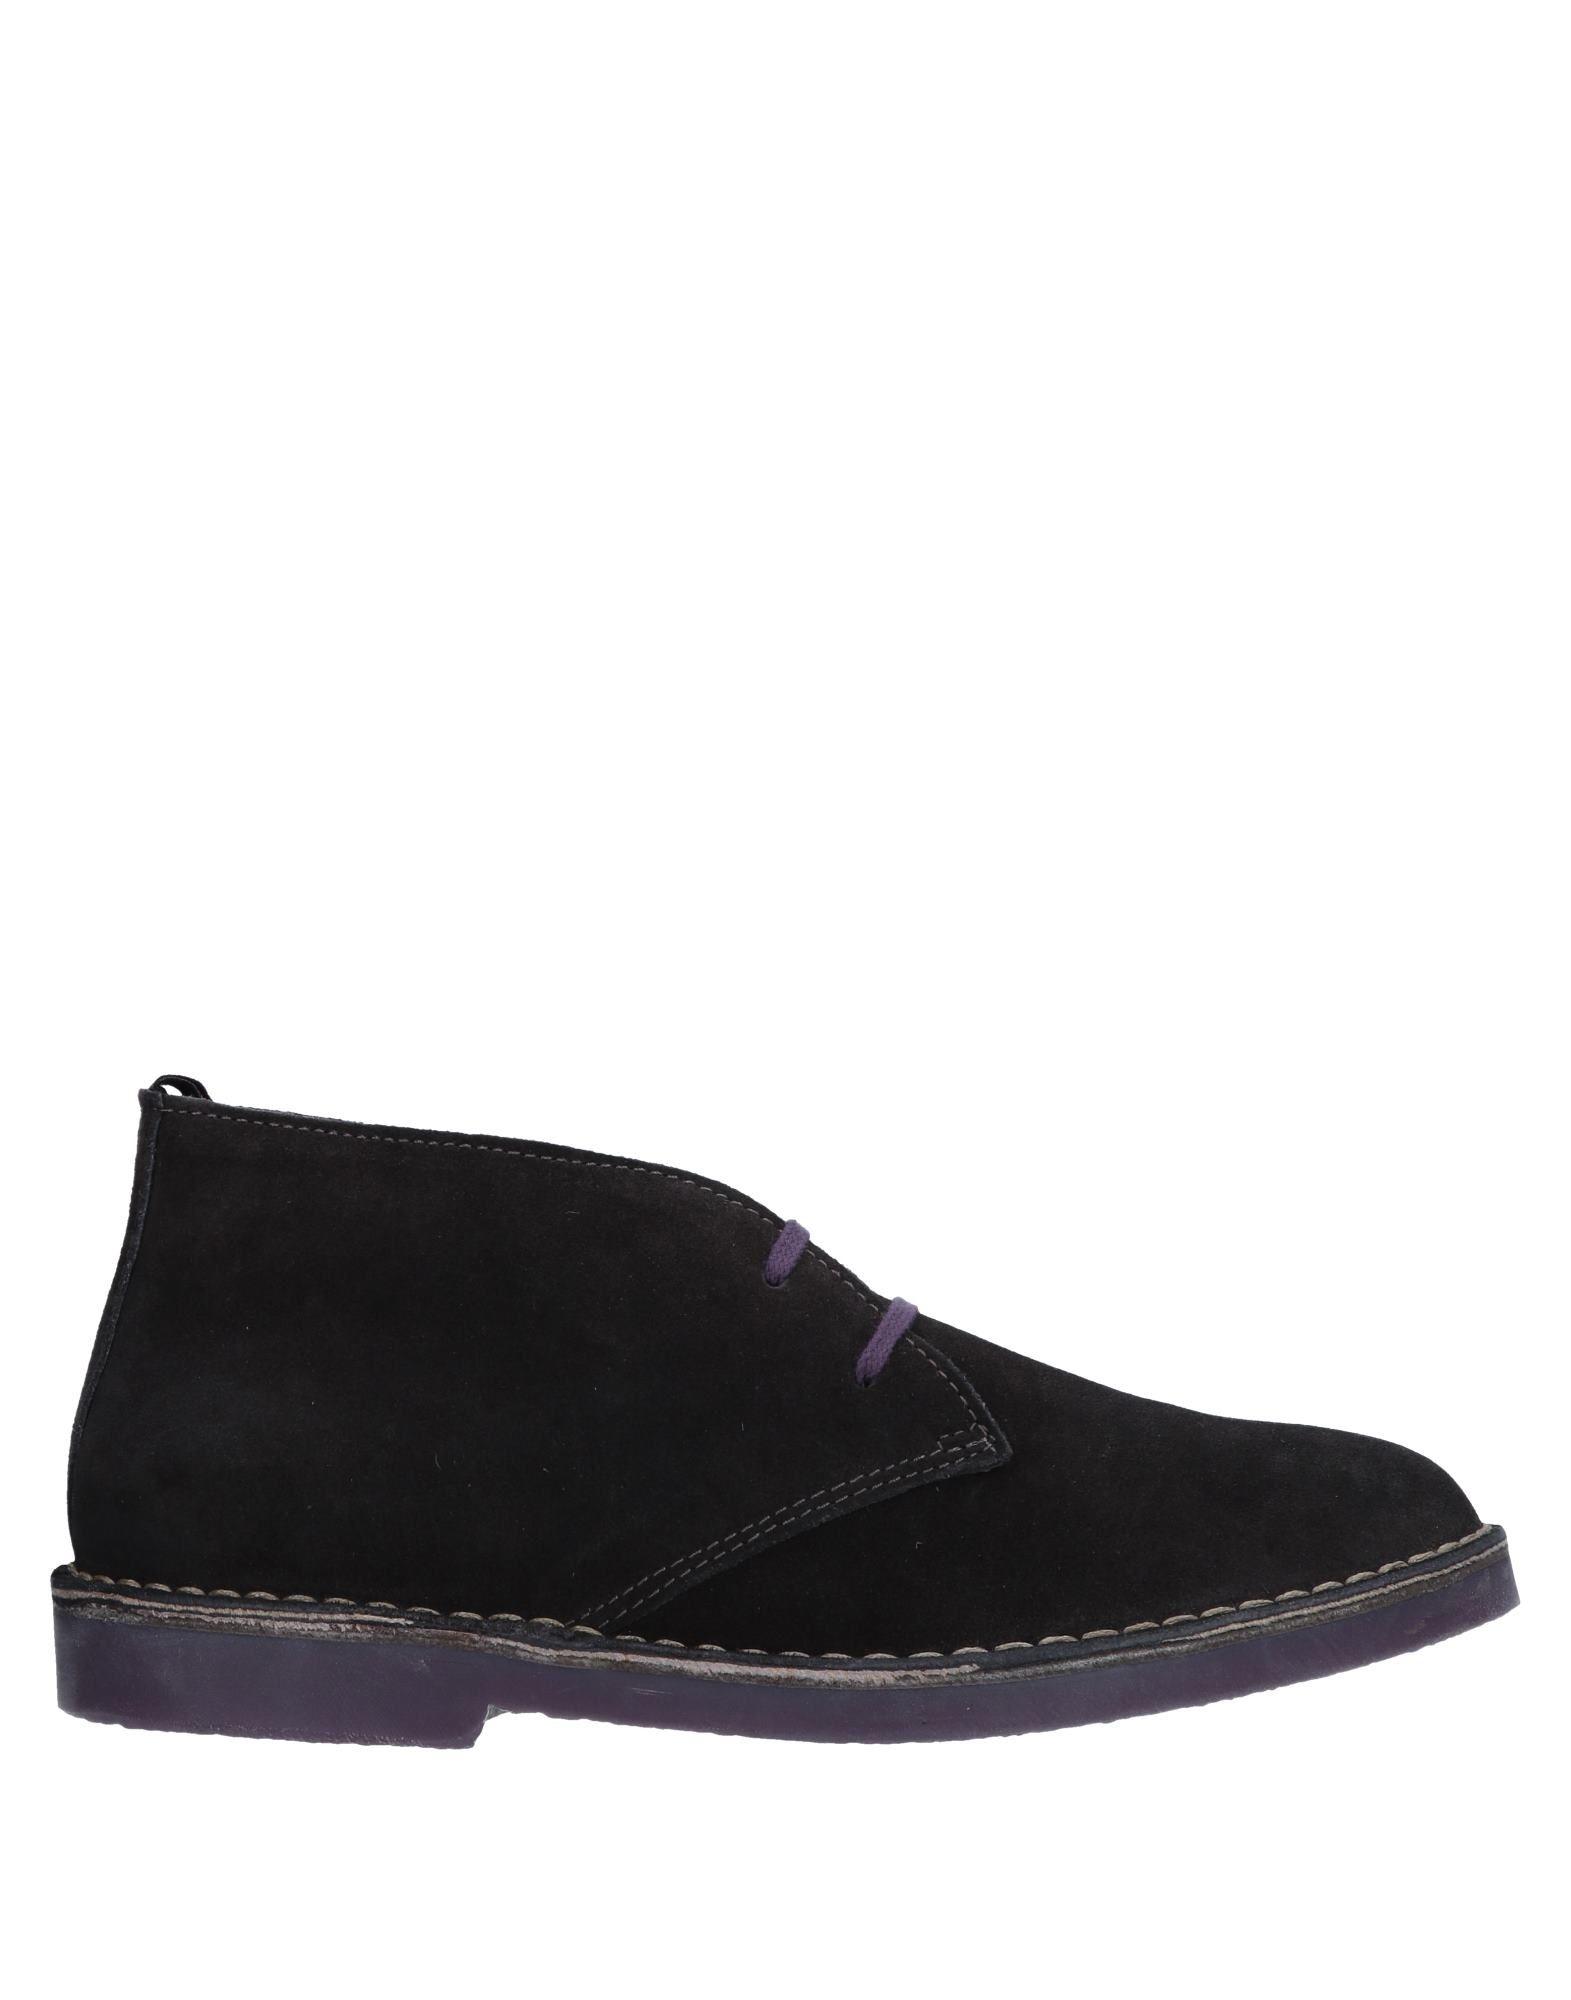 Rabatt echte Schuhe Wally Walker Schnürschuhe Herren  11256234IT